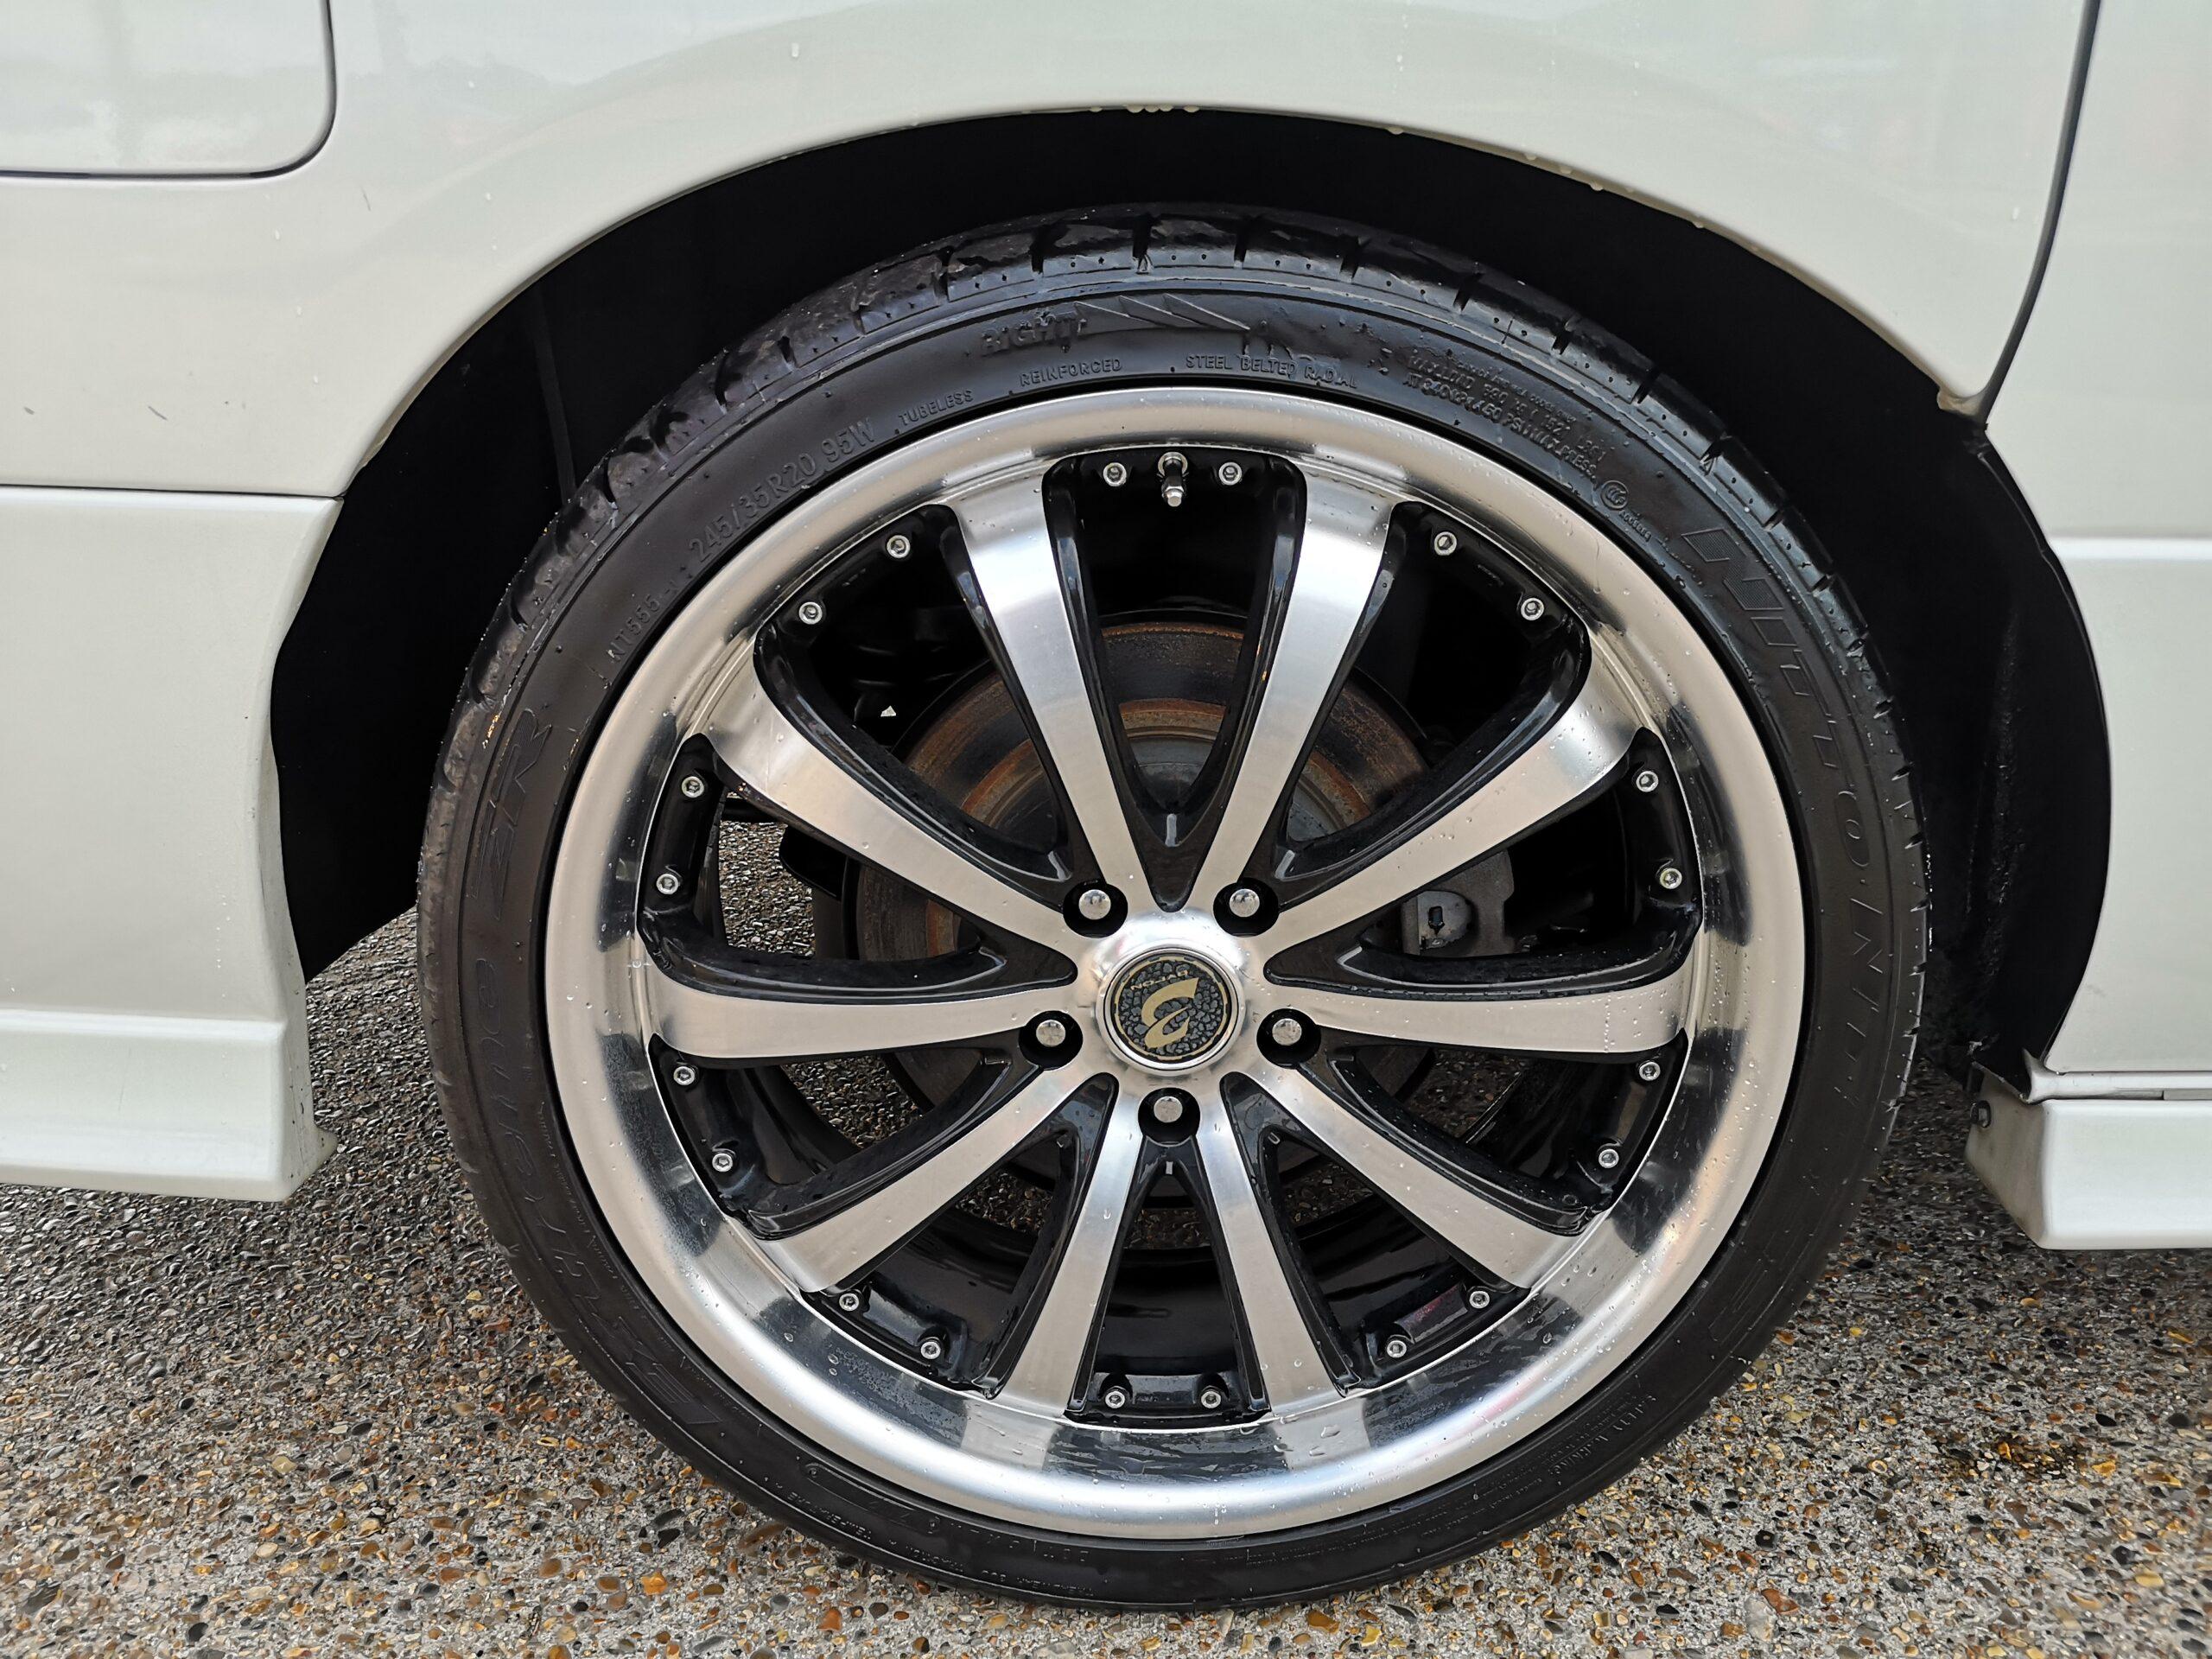 NISSAN ELGRAND RIDER-S 3.5 V6 PETROL 2005(54) 4 WHEEL DRIVE DOUBLE SUNROOF